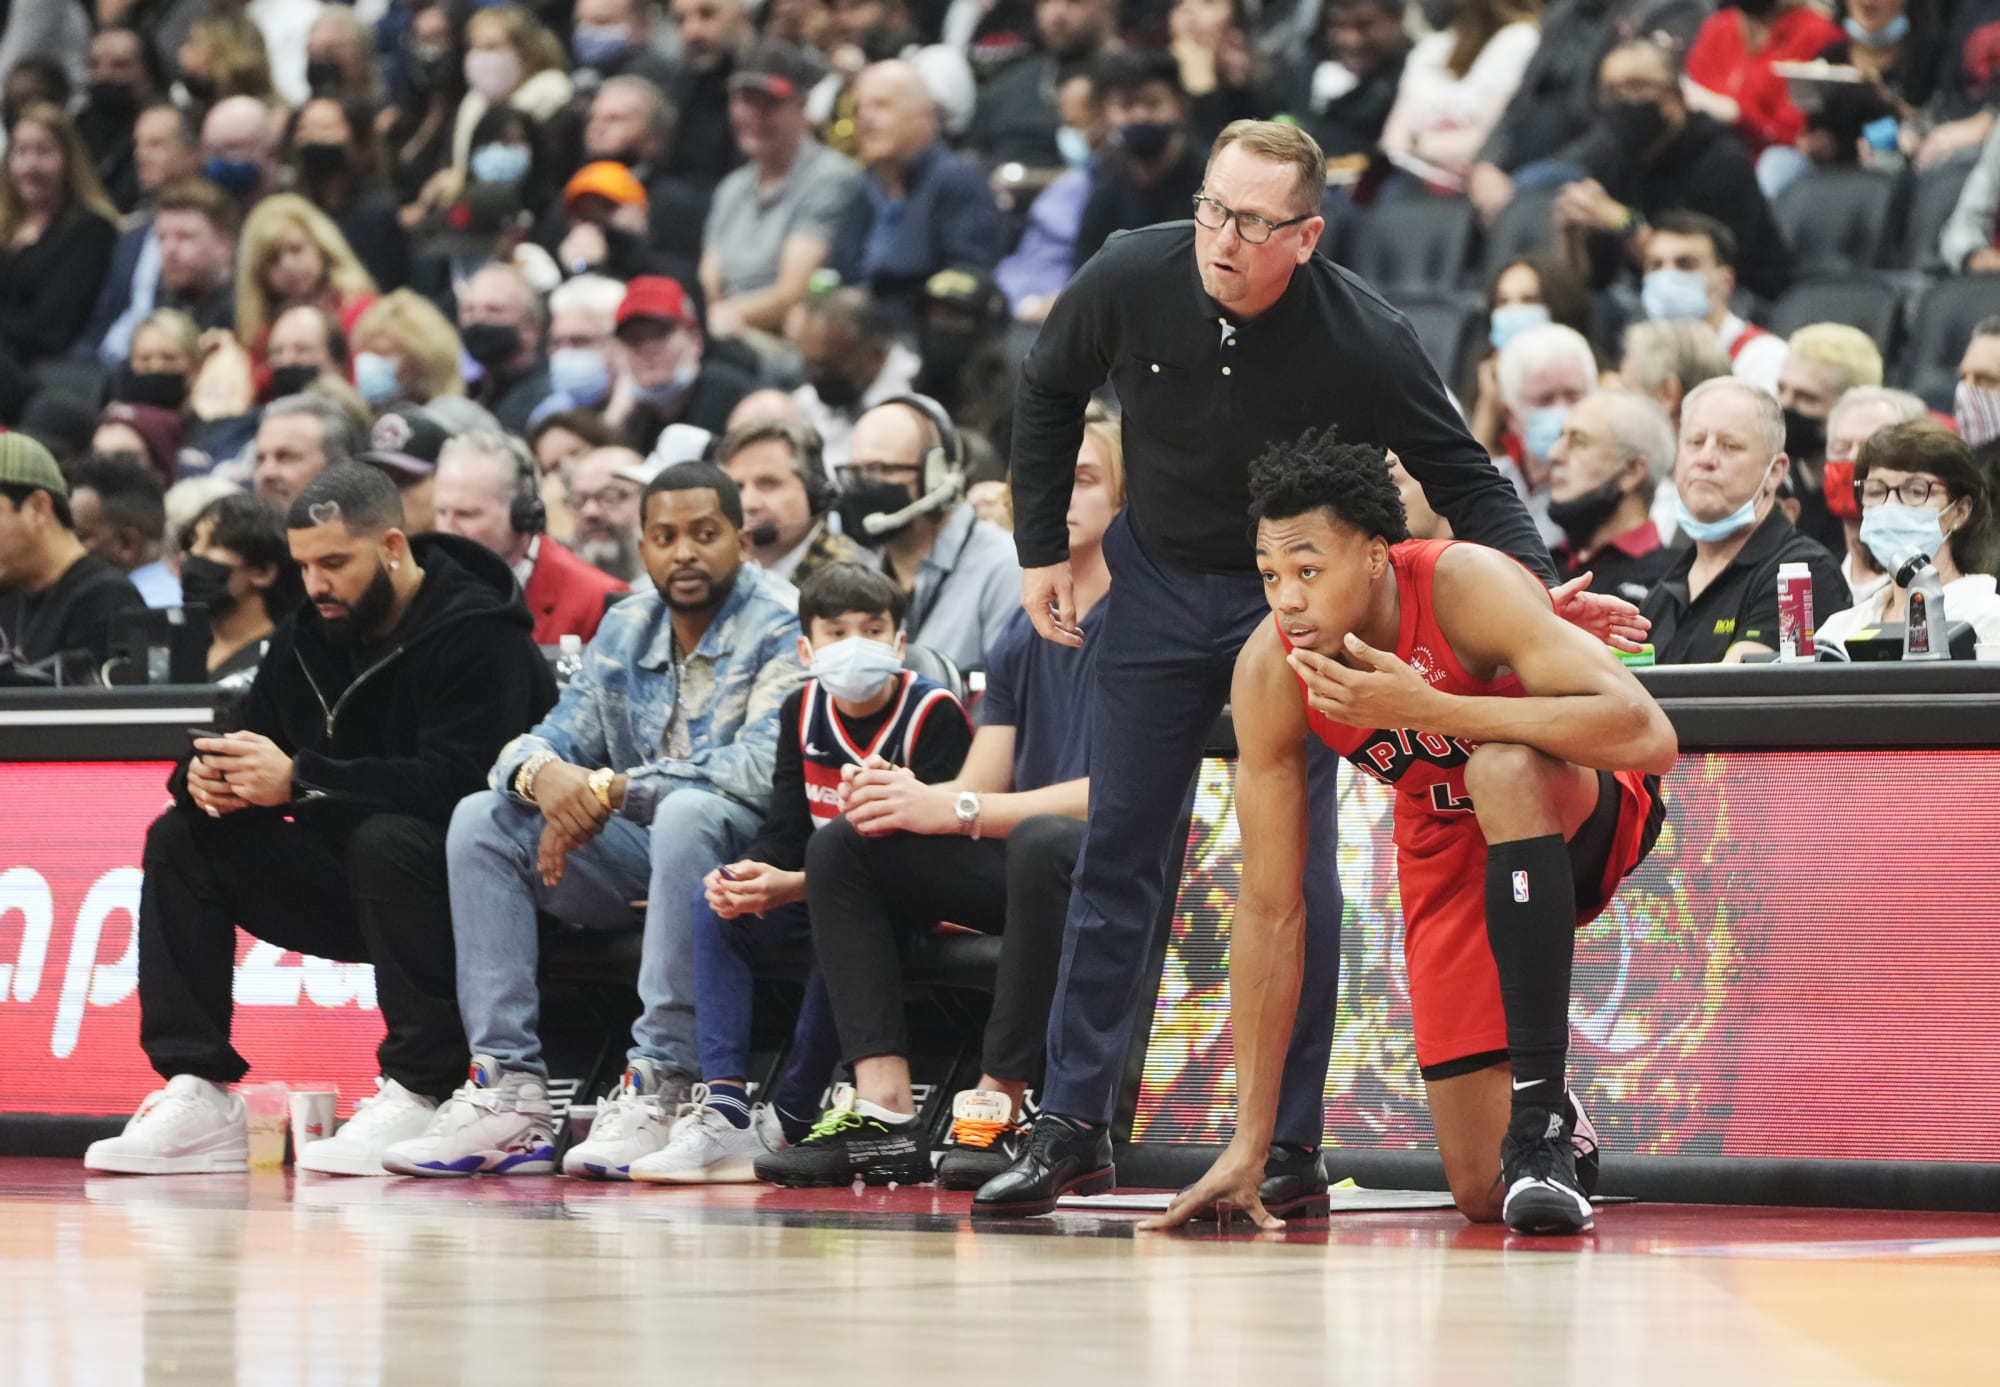 Toronto Raptors: Game 1 loss still revealed squad's true identity